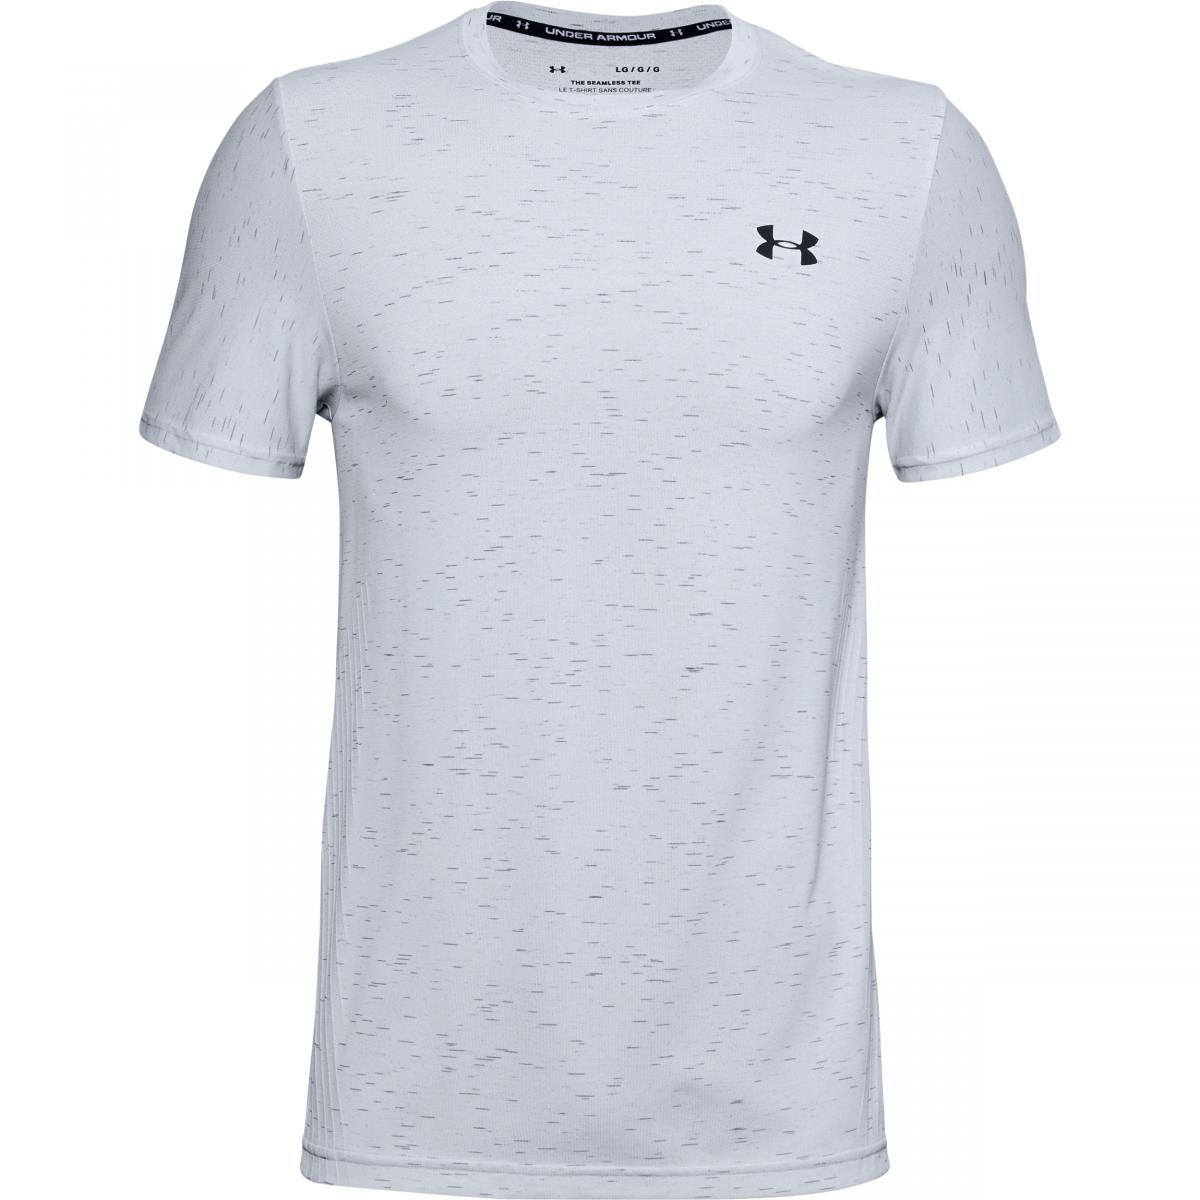 Under Armour  UA Seamless SS, t-skjorte, herre